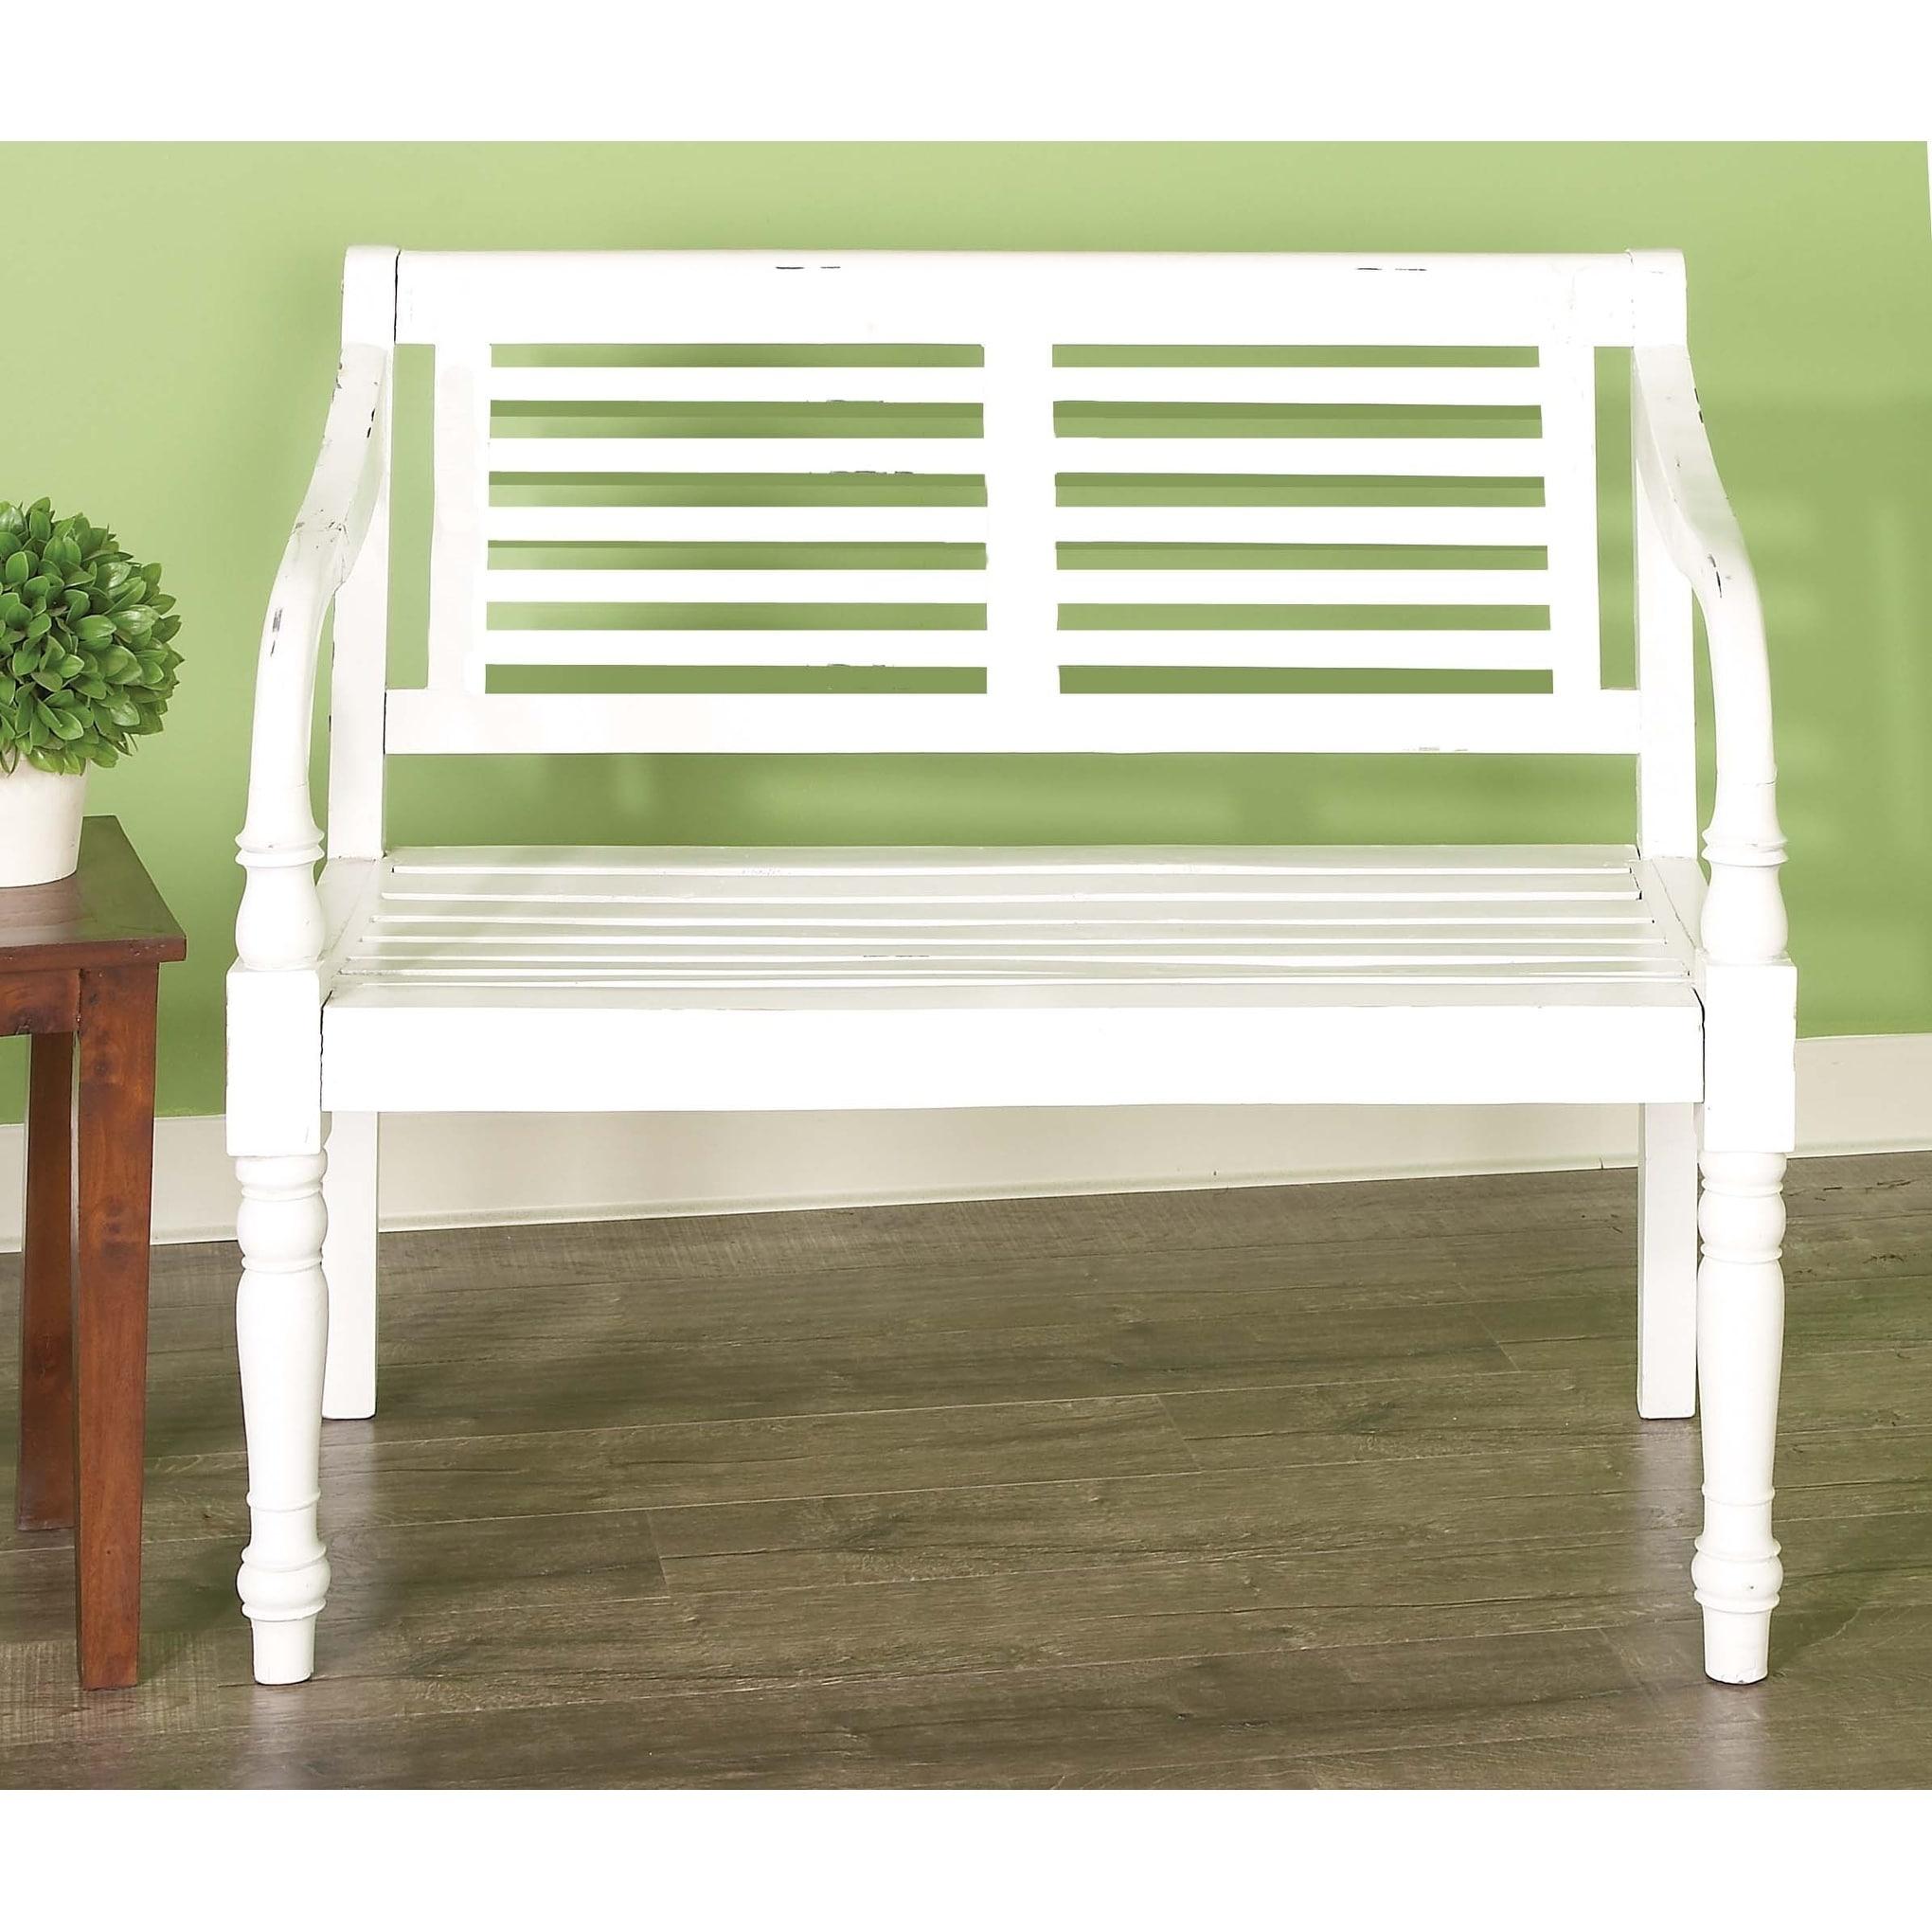 Studio 350 White Wood Traditional Bench, Size 36 x 40 x 2...